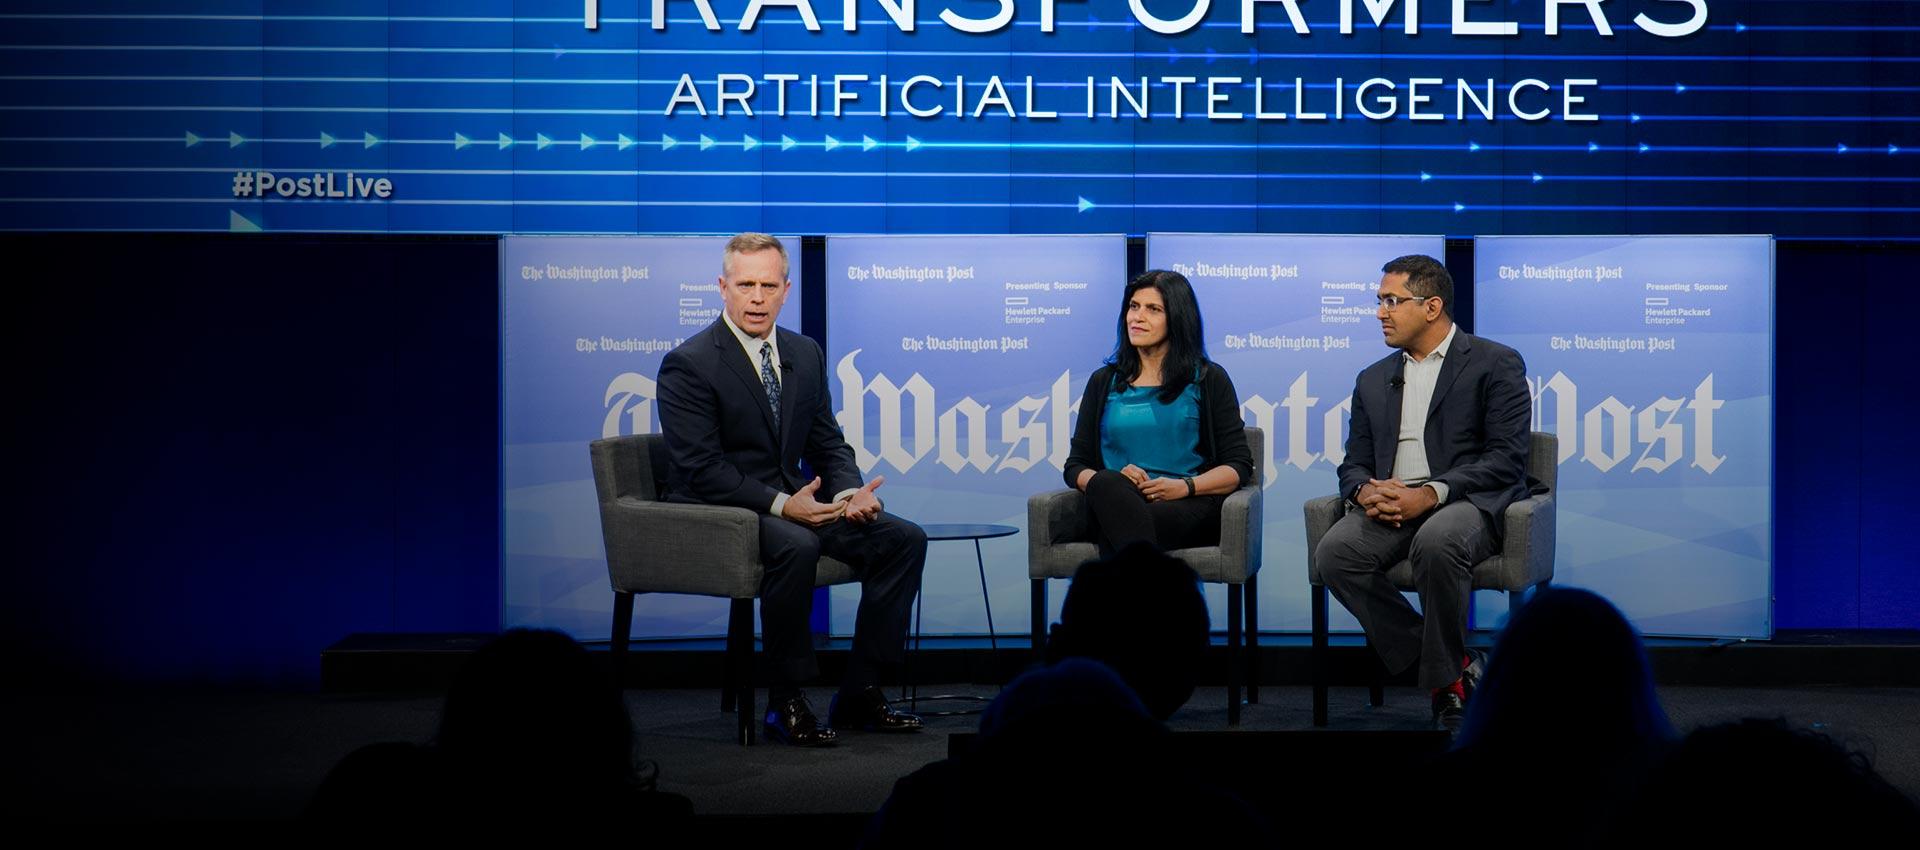 Washington Post Live: How AI Creates Measurable Impact